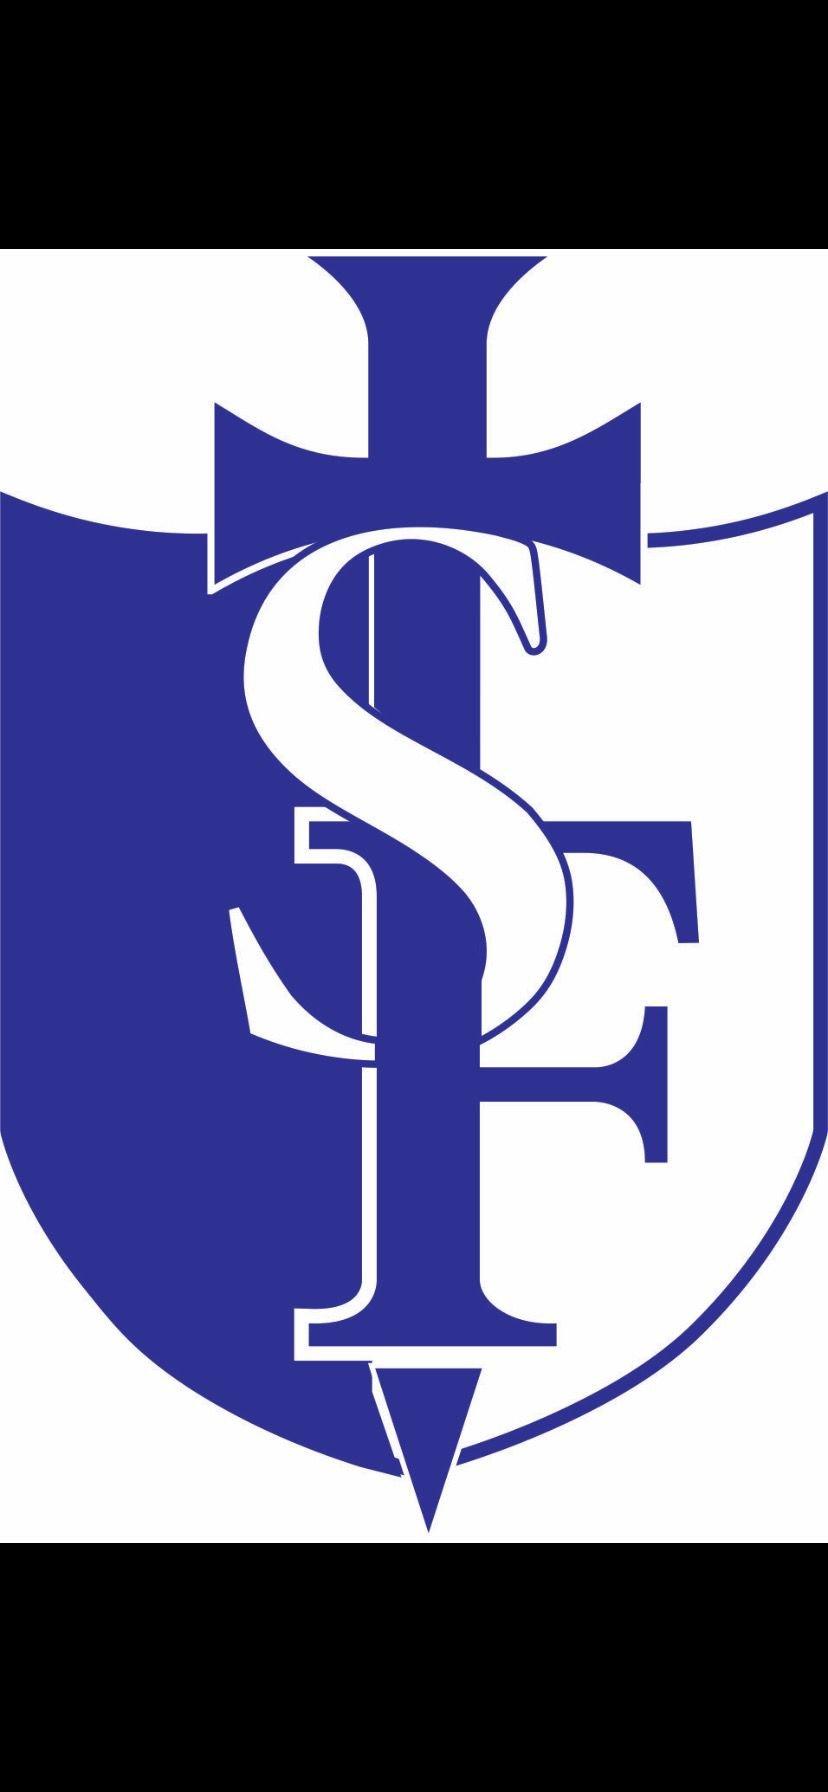 St. Fred logo